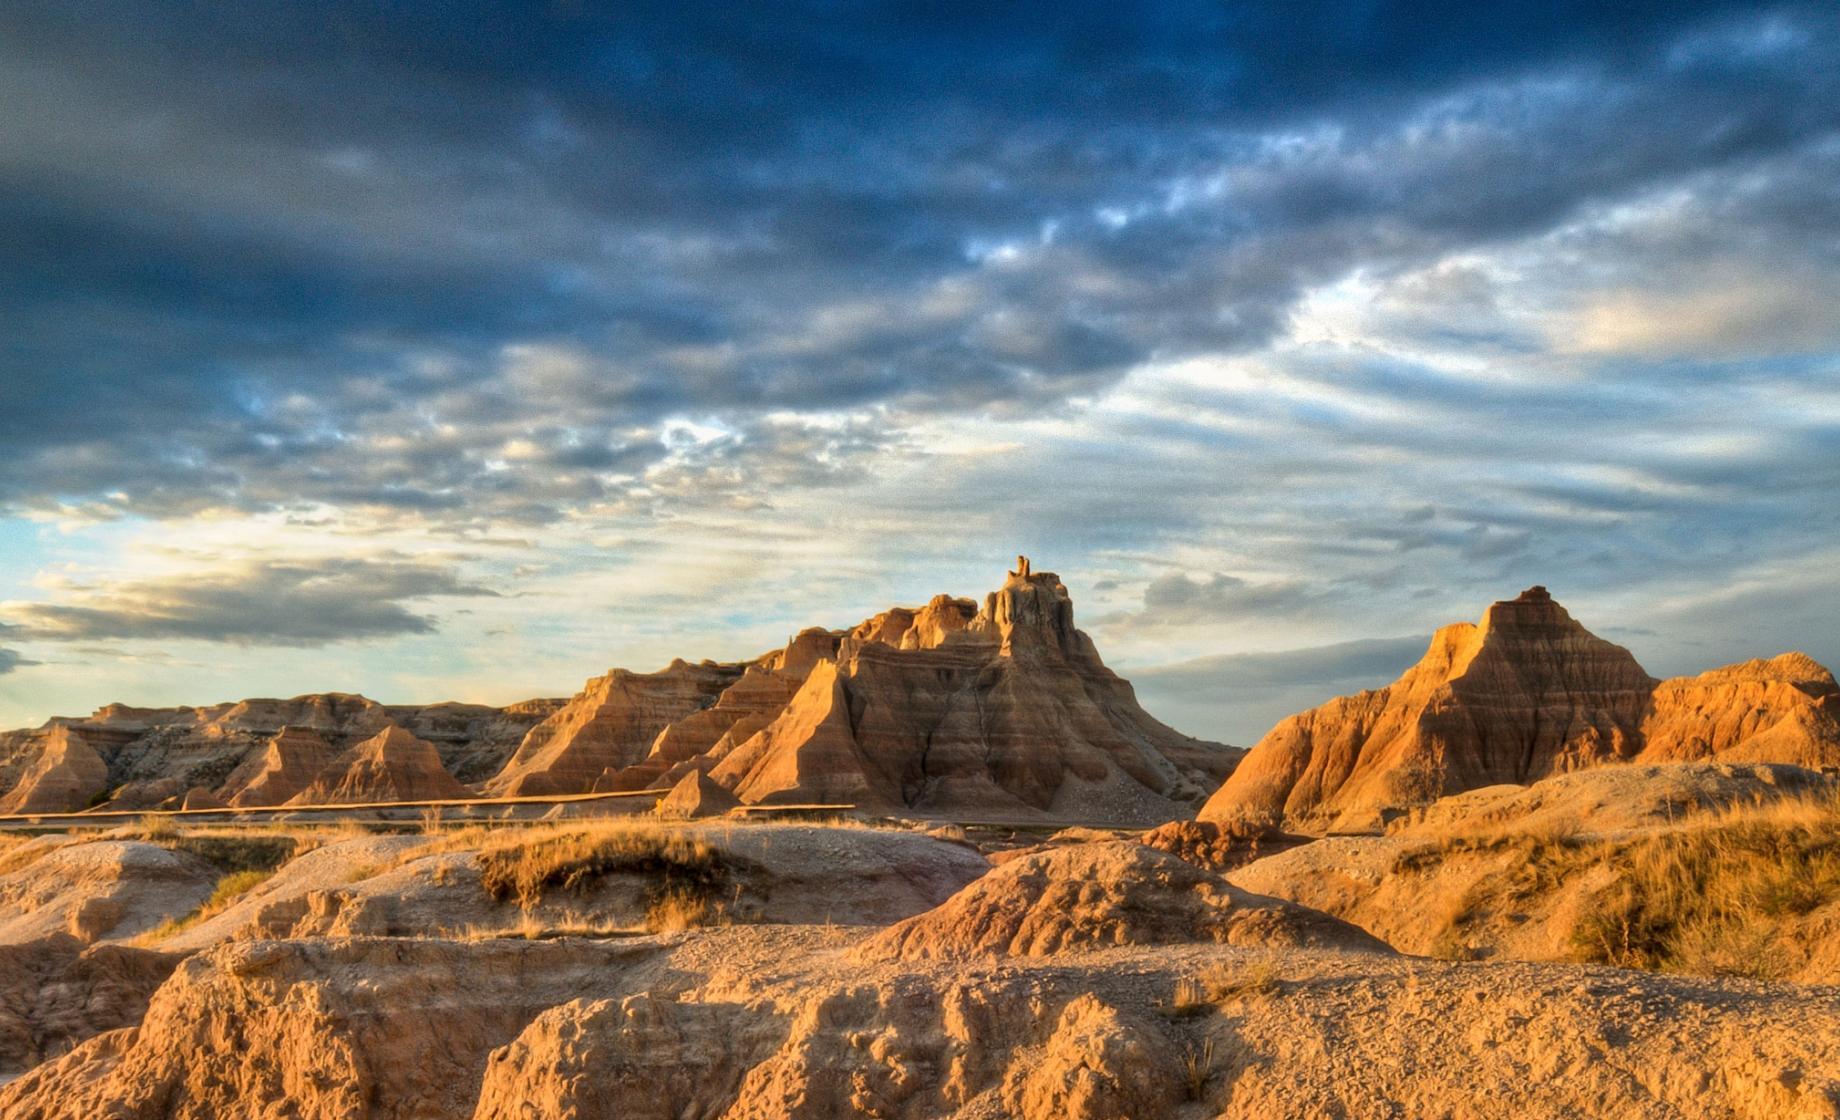 Badlands And Native American Tour Travel South Dakota